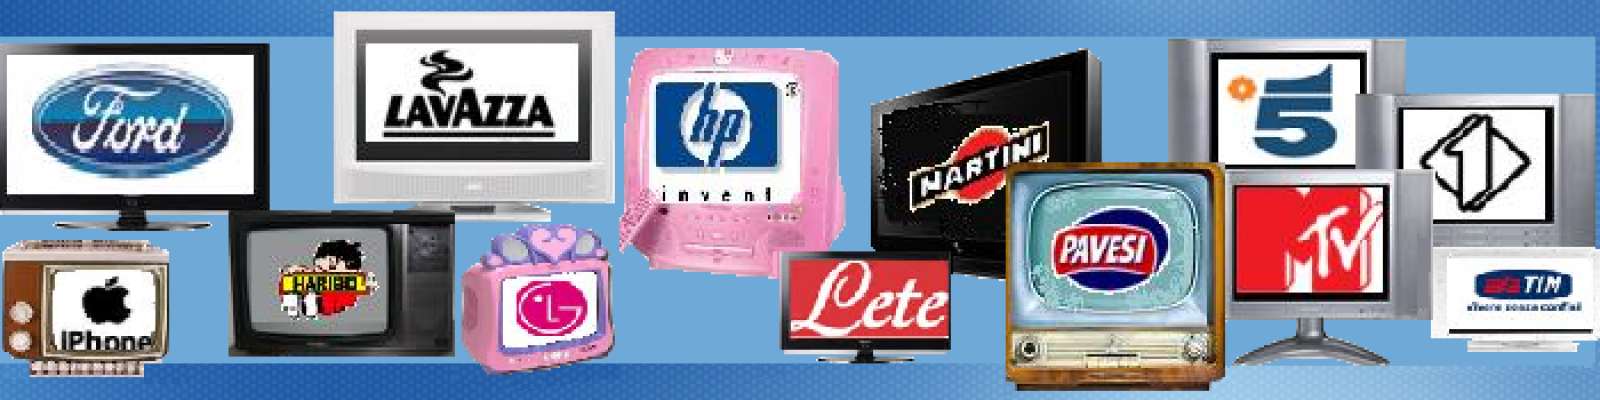 spot commerciali televisivi